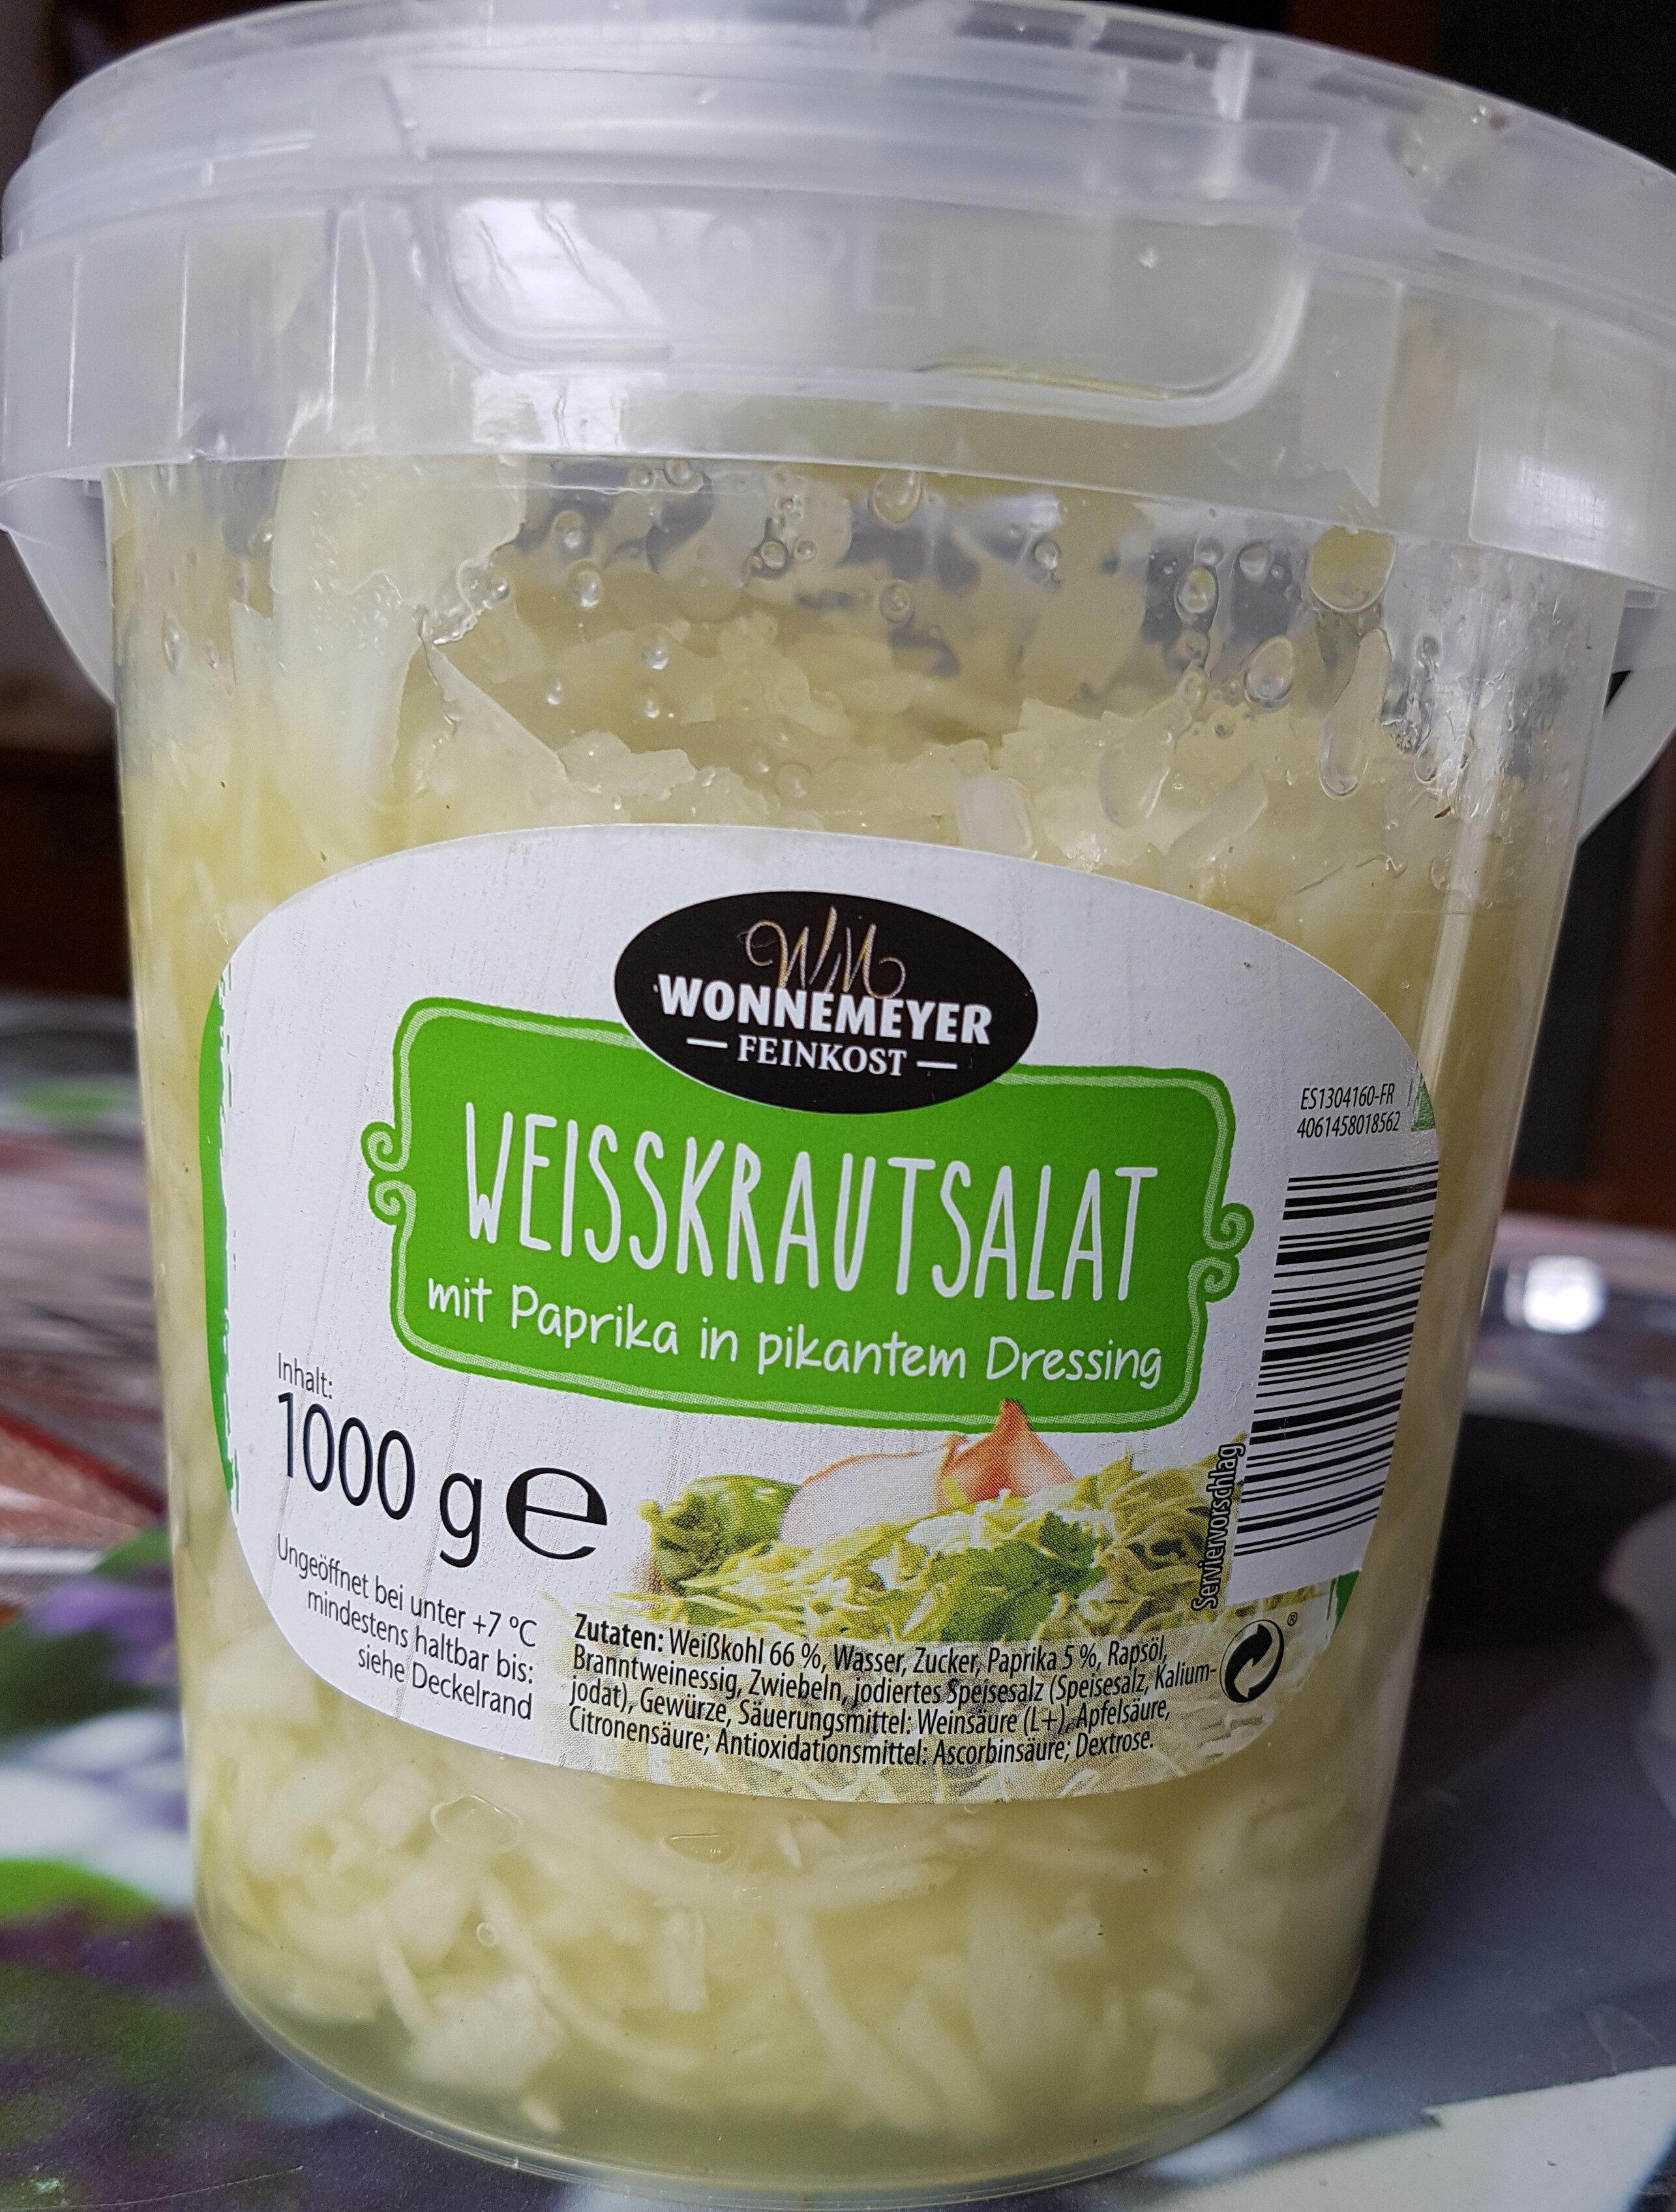 Weißkrautsalat - Product